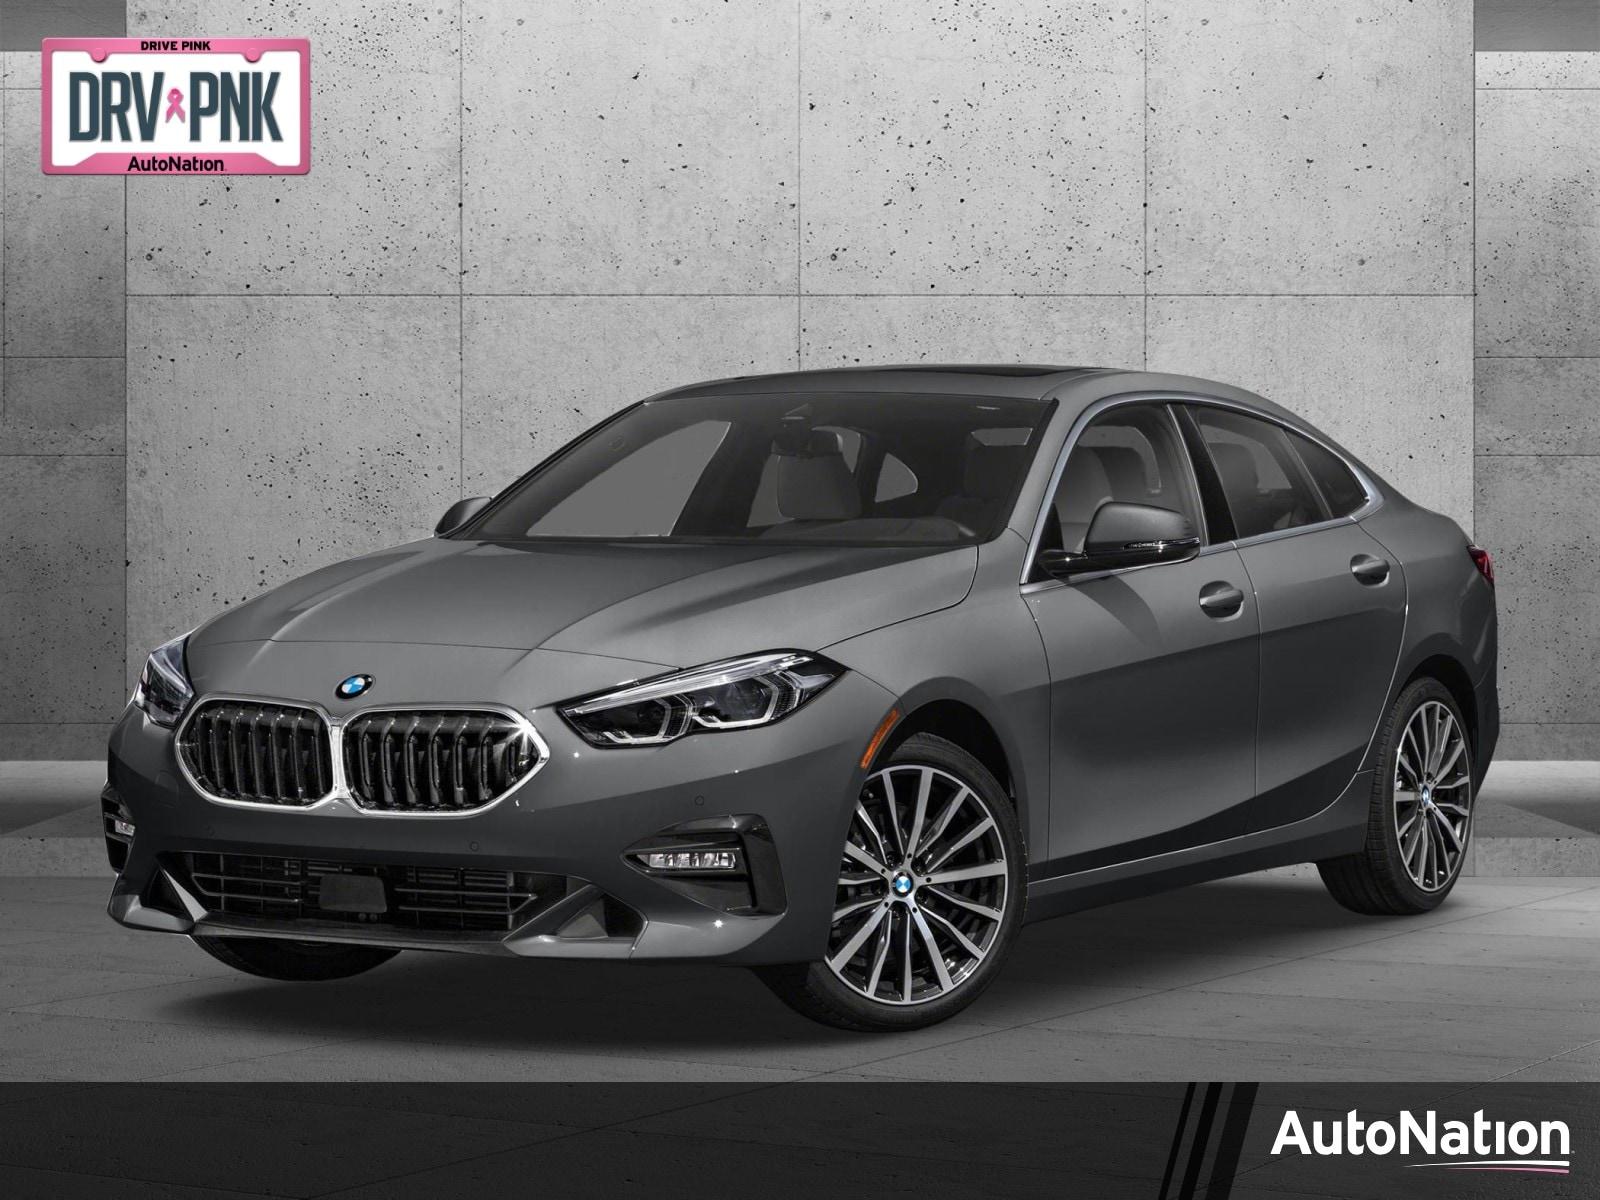 New Bmw Inventory Nationwide Autonation Drive